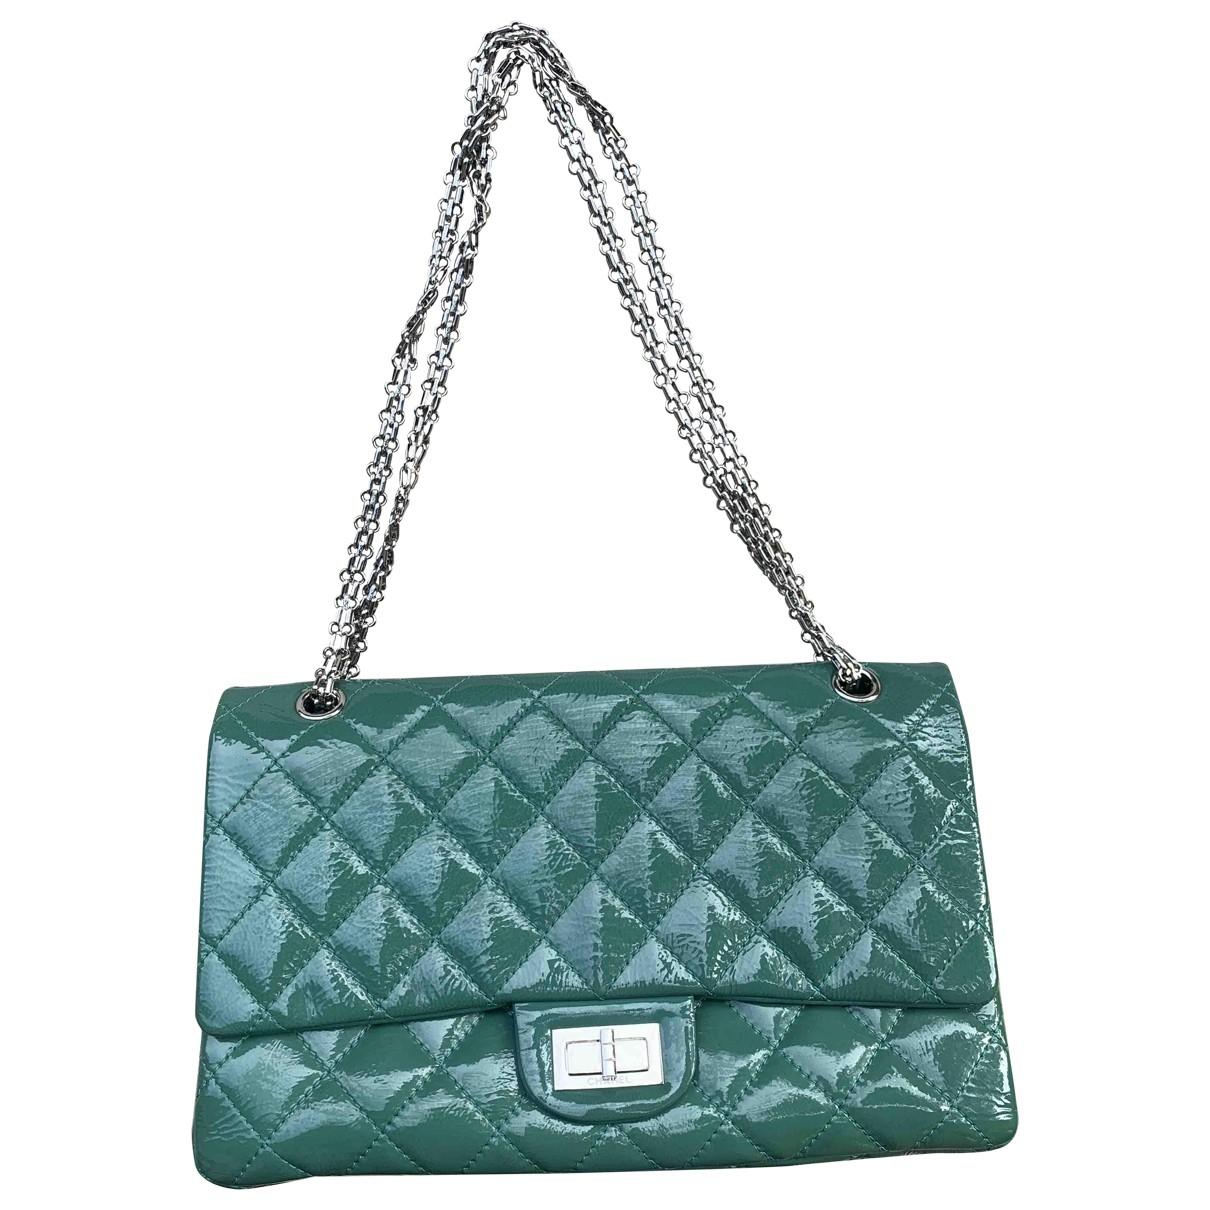 Chanel 2.55 Green Patent leather handbag for Women \N